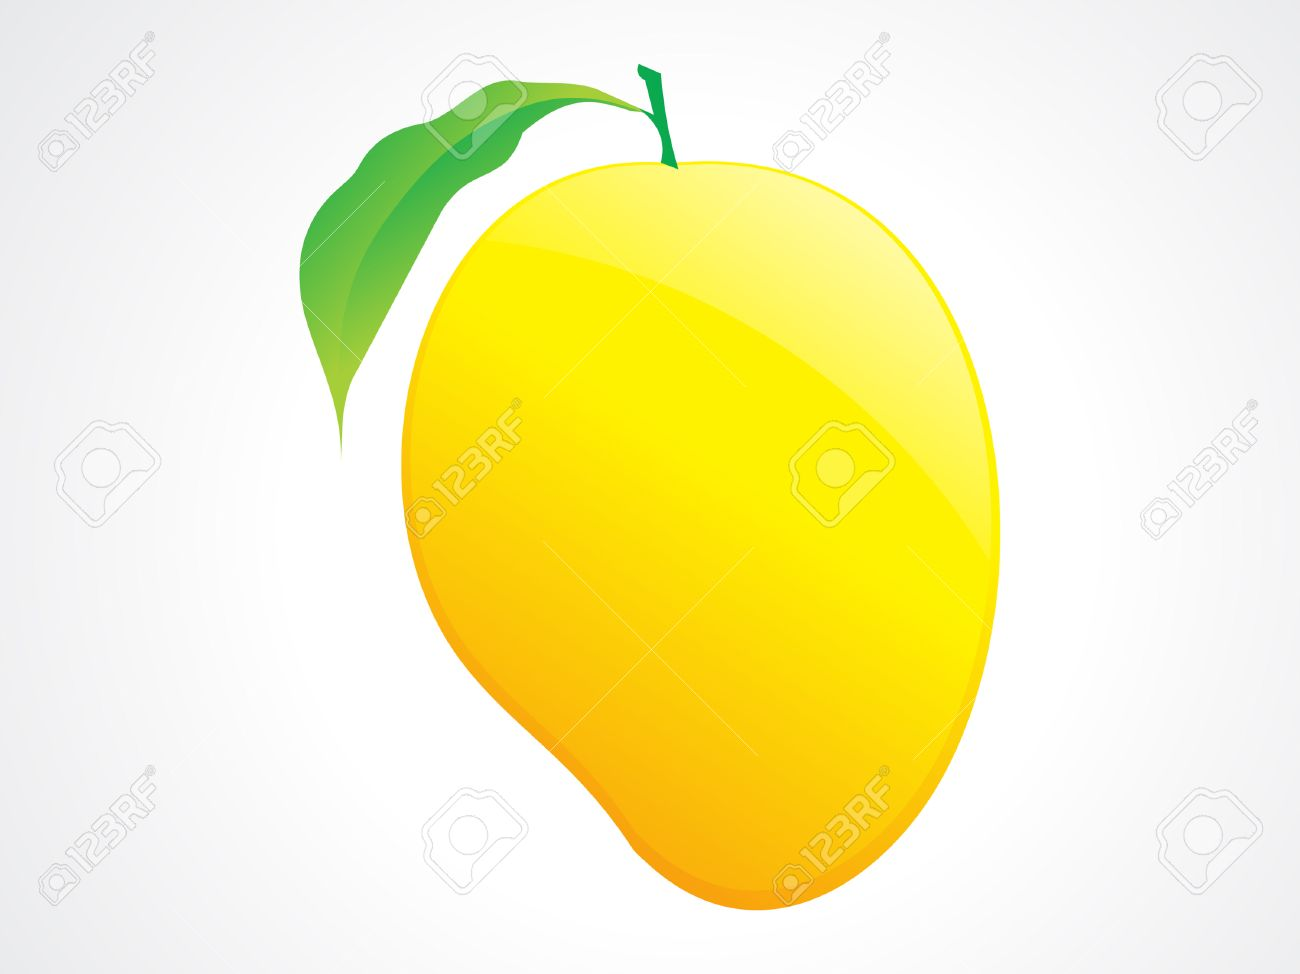 tasteful mango fruit and leaf illustration.